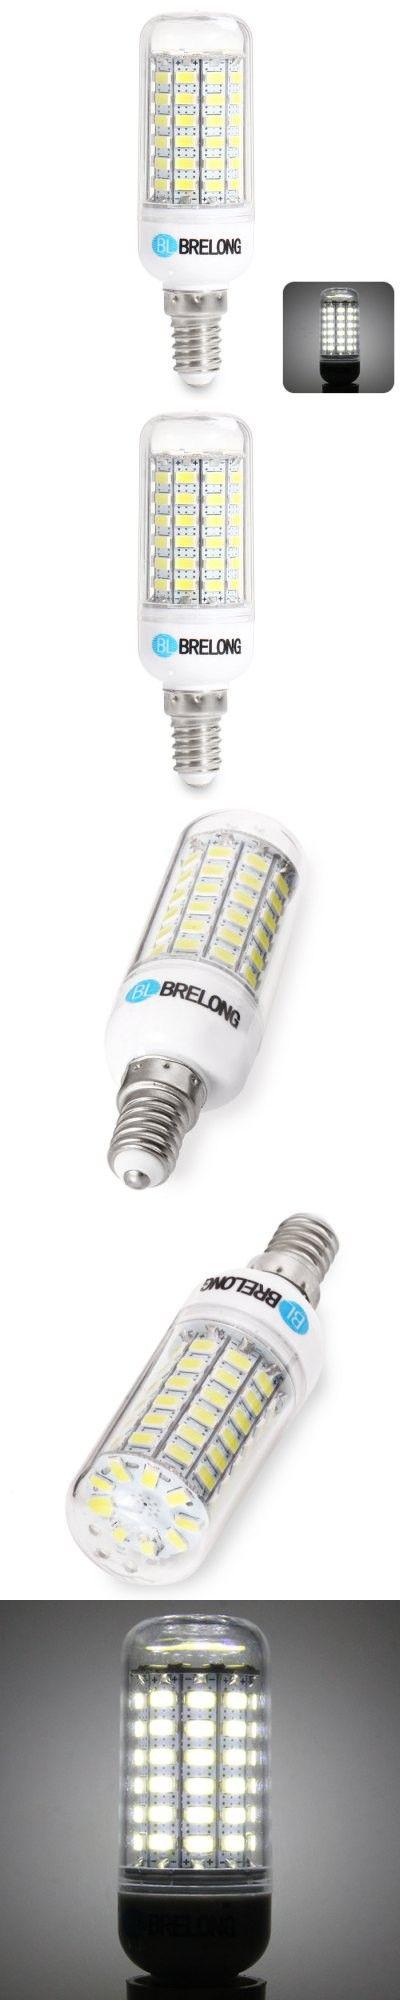 LED Light Bulbs | BRELONG E14 LED Corn Bulb